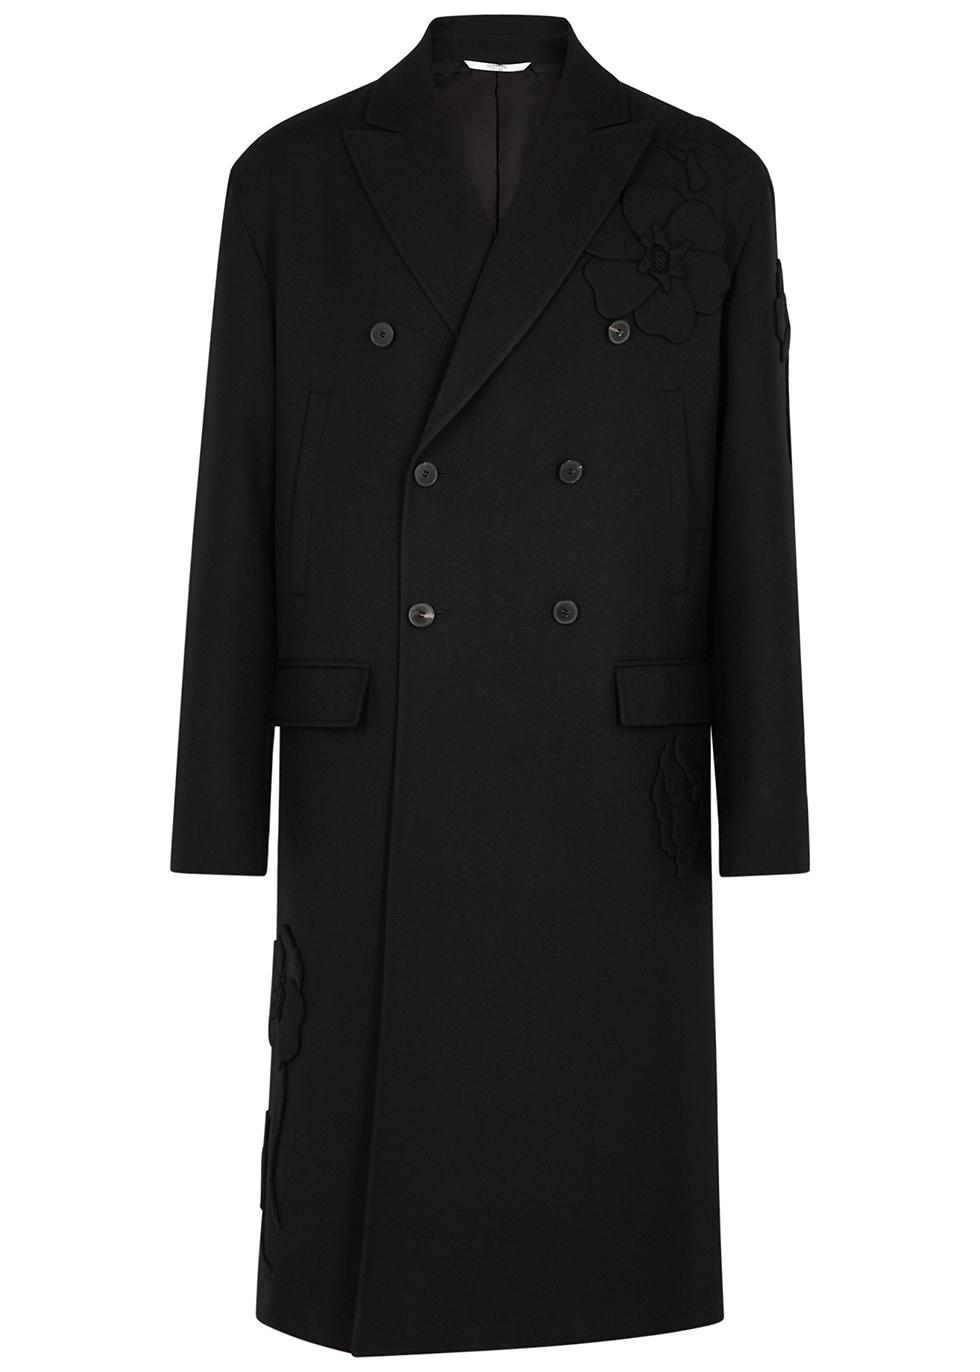 Black floral-appliquéd wool coat